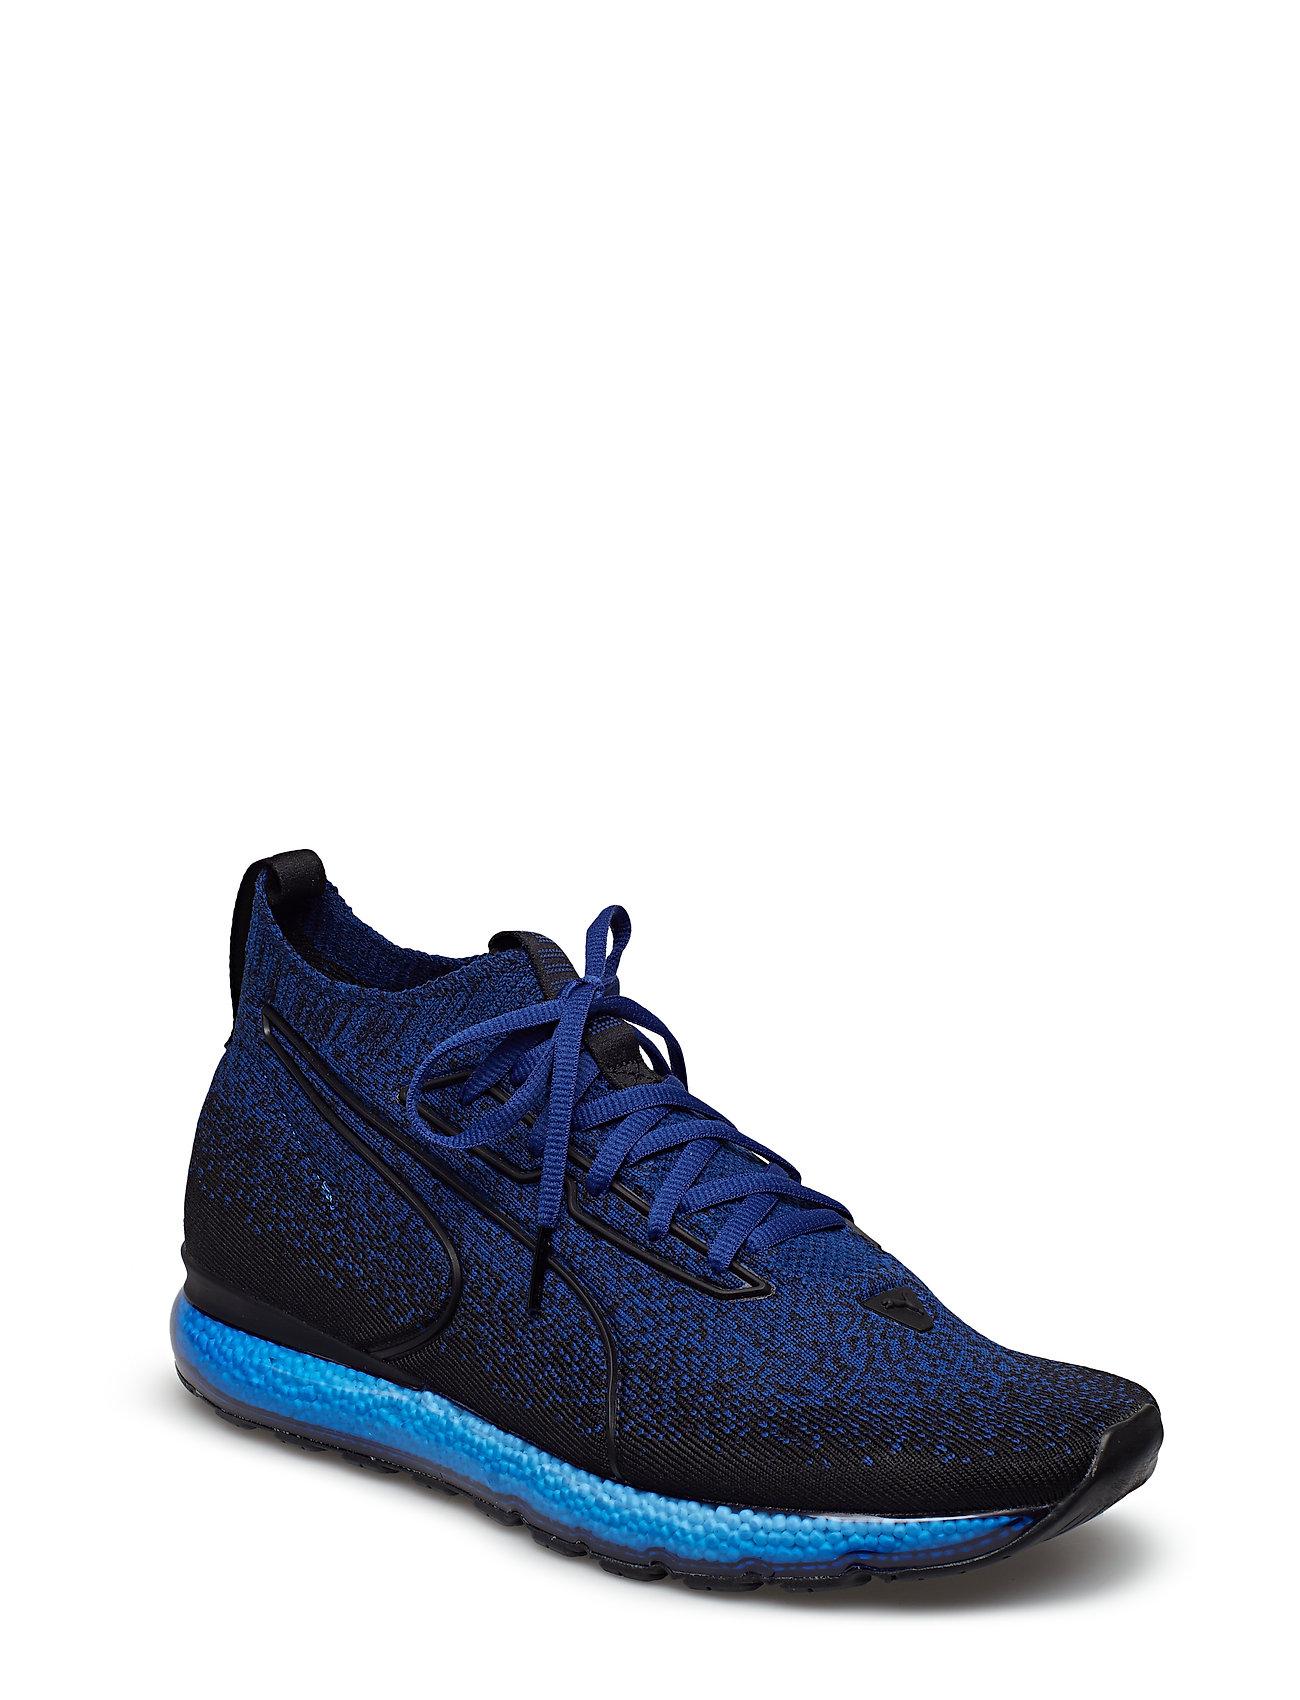 Puma Jamming FS shoes blue